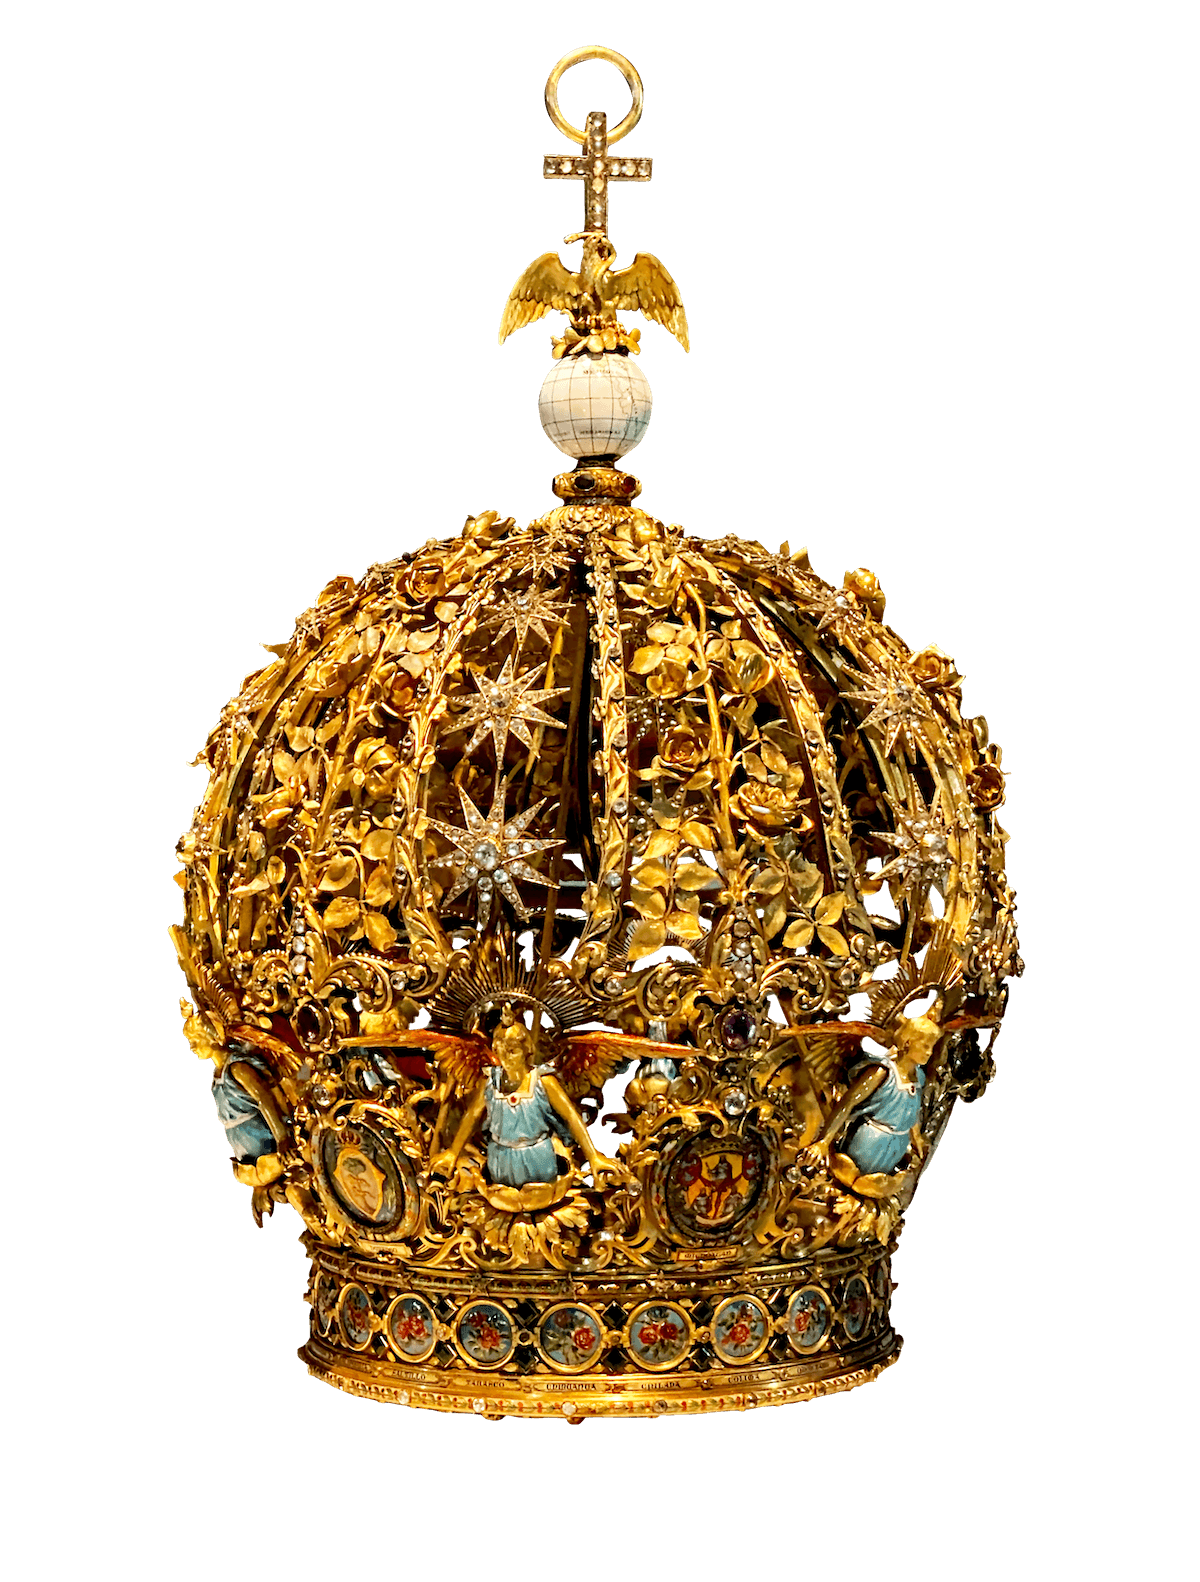 La corona de la Virgen de Guadalupe.